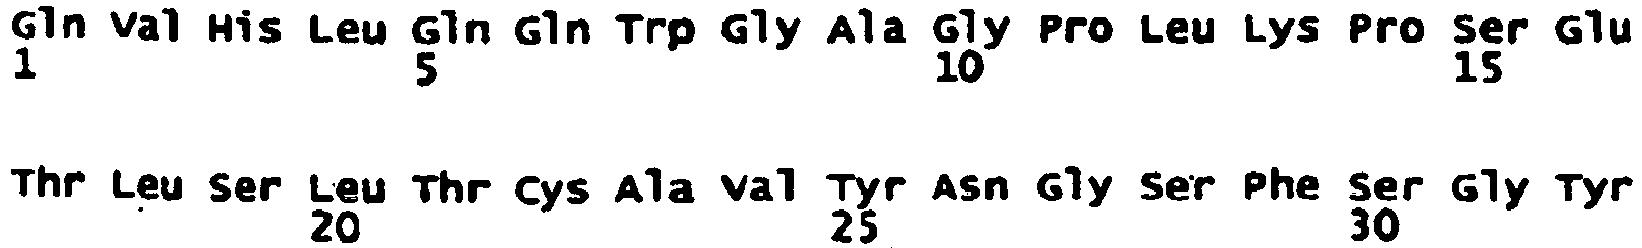 Figure imgb0411